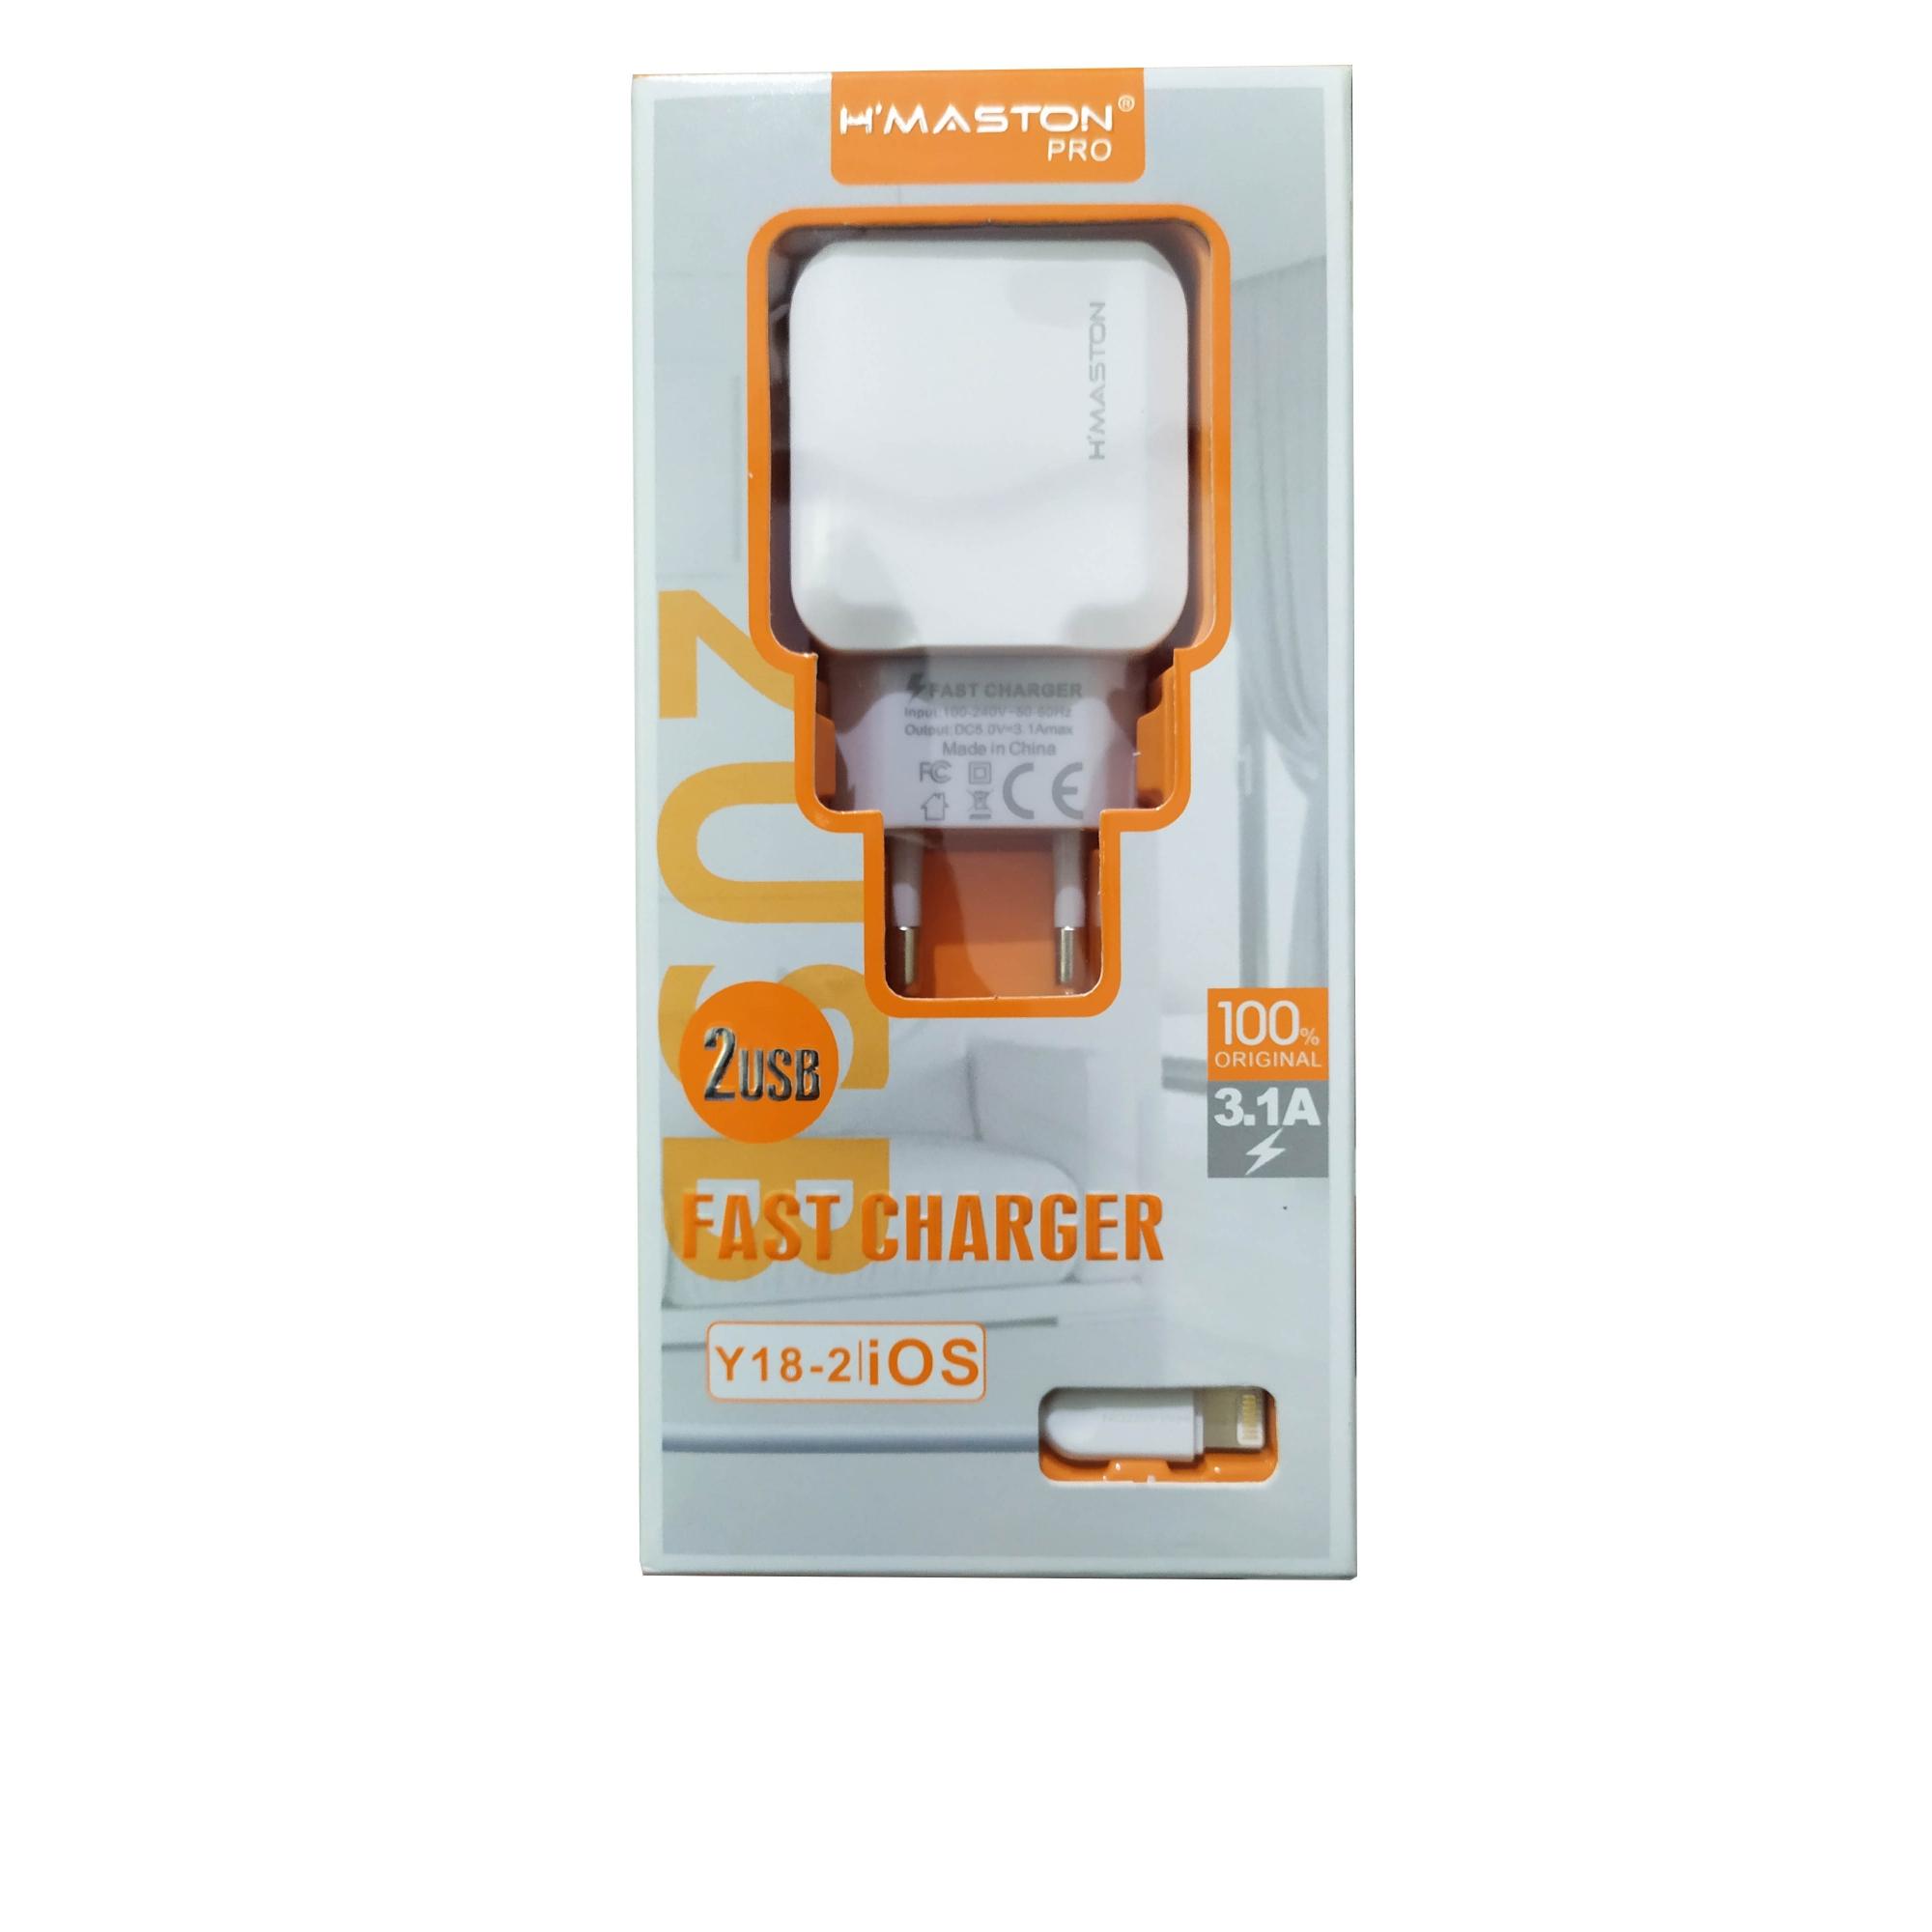 Carregador e Cabo Fast Charger Lightning 3.1A Y18-2 iOS